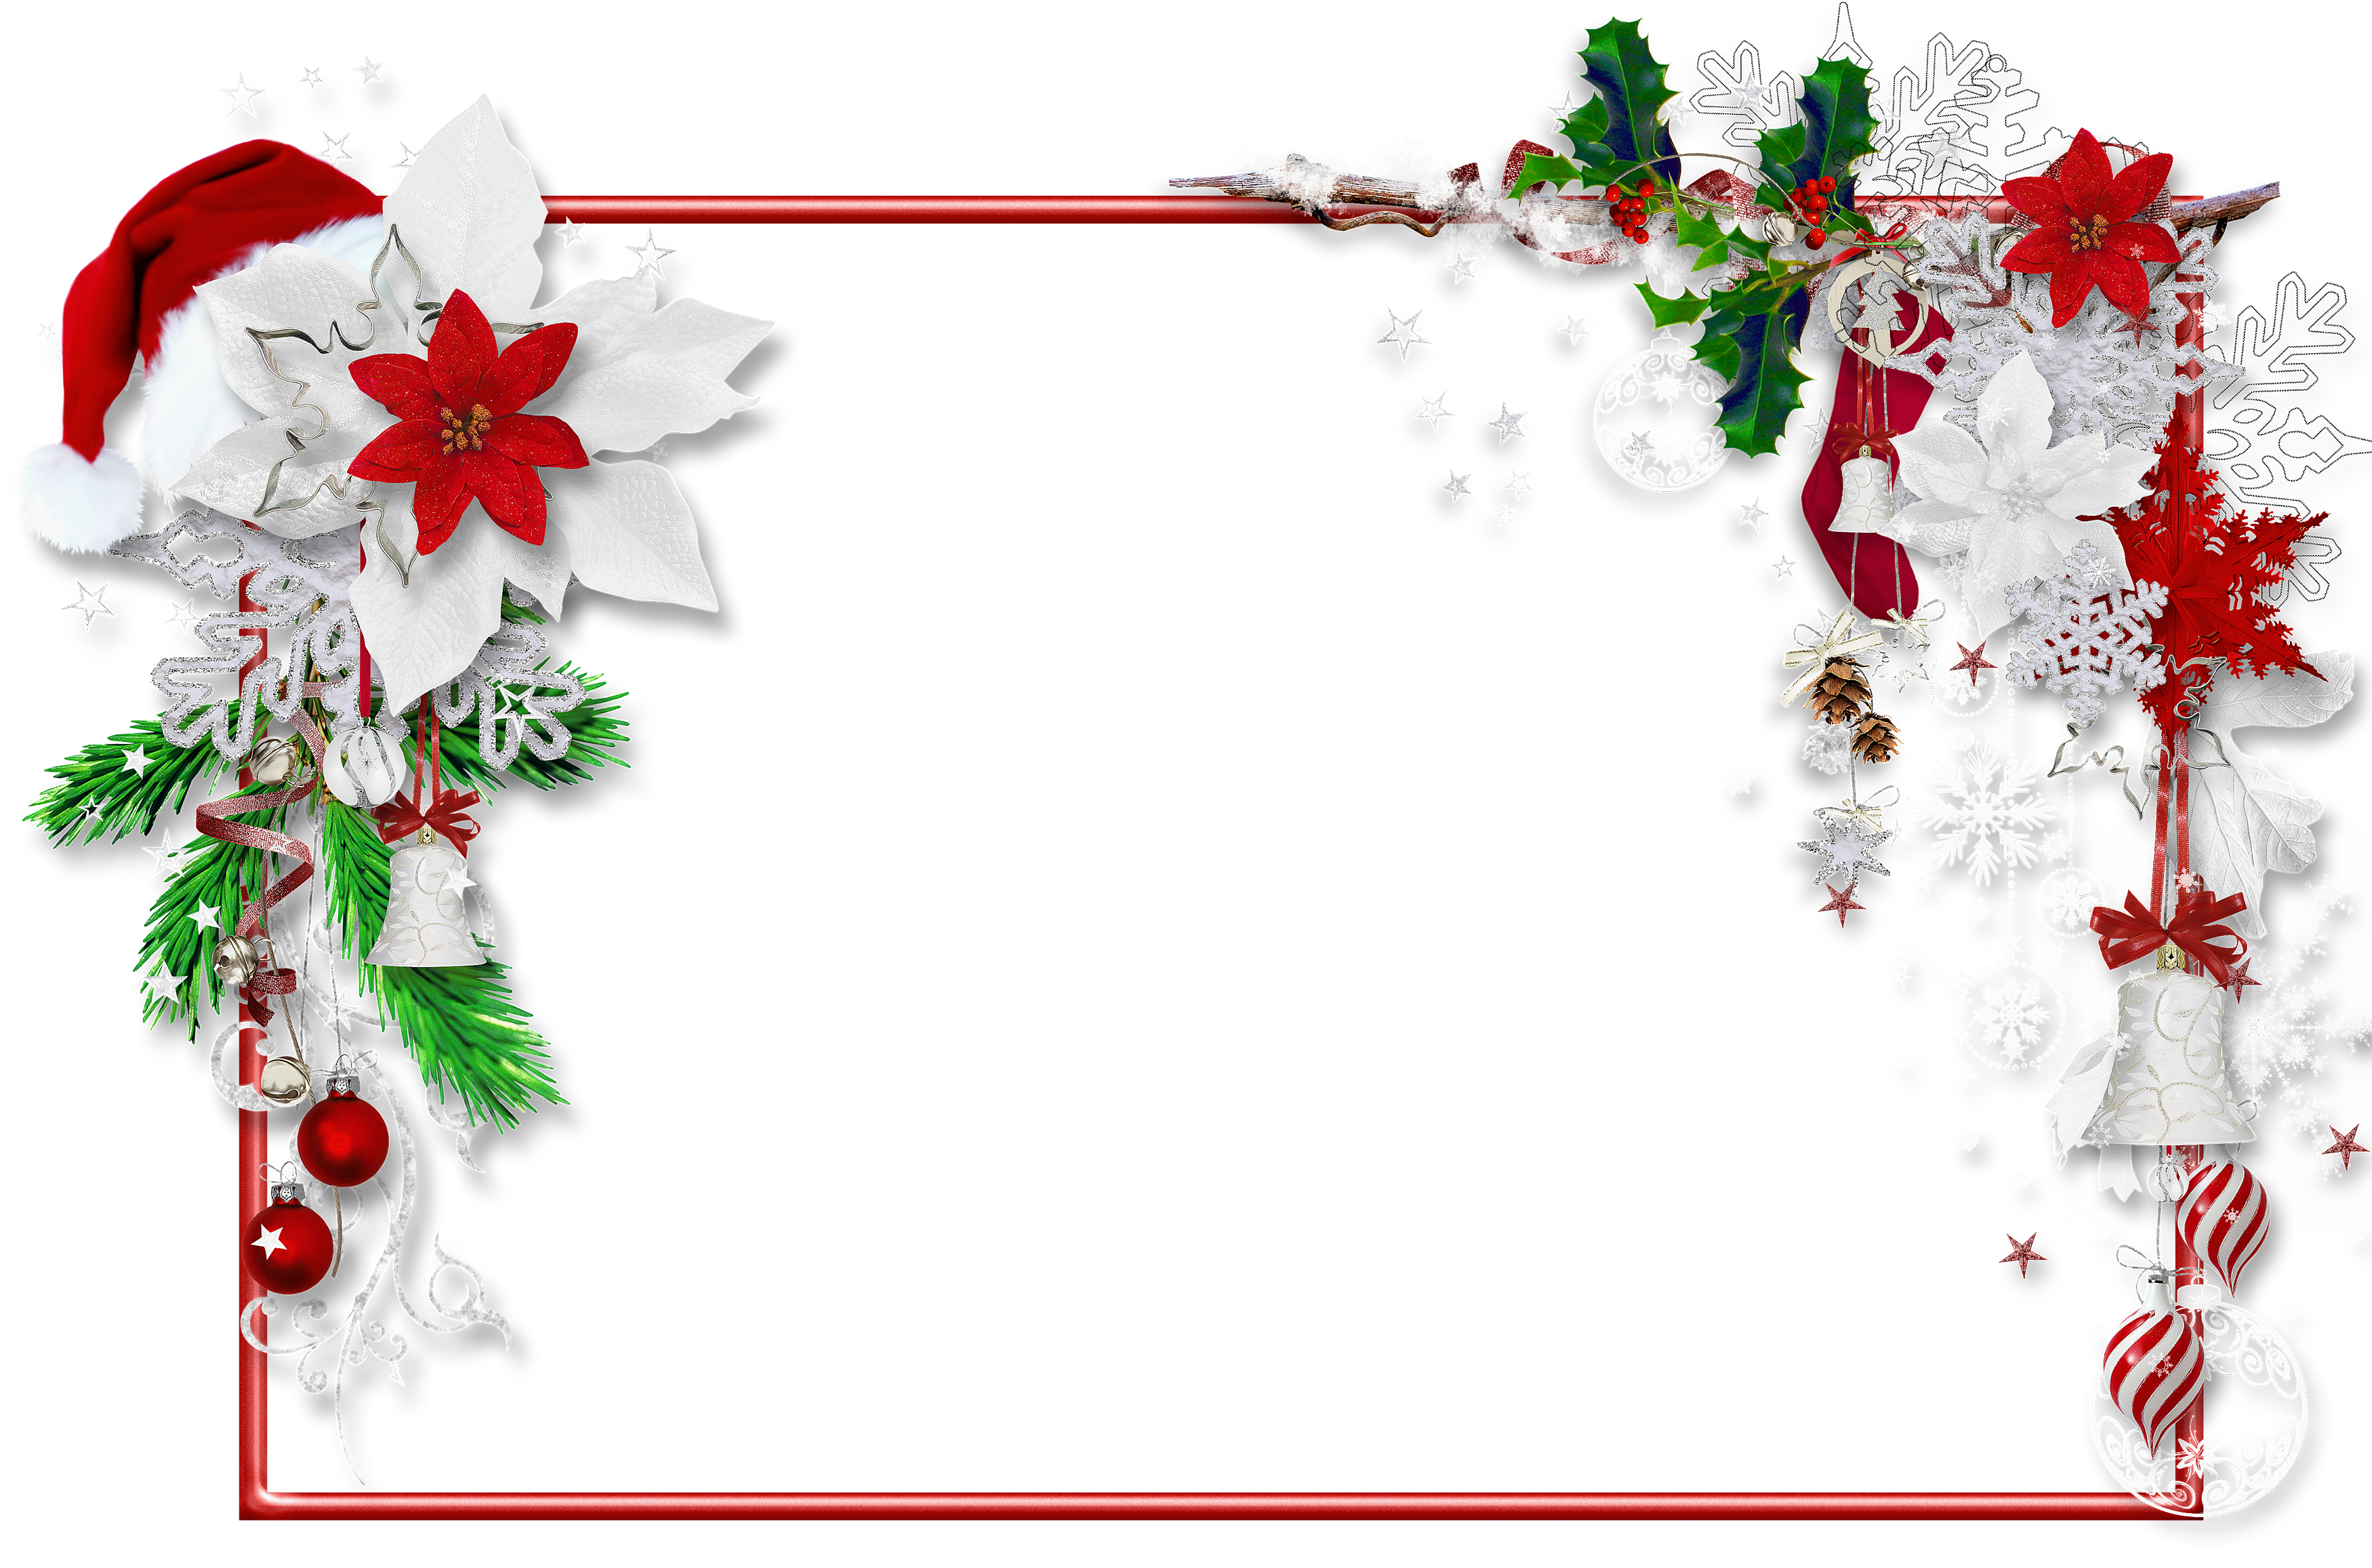 Christmas Photo Frame With Santa Hat And Mistletoe